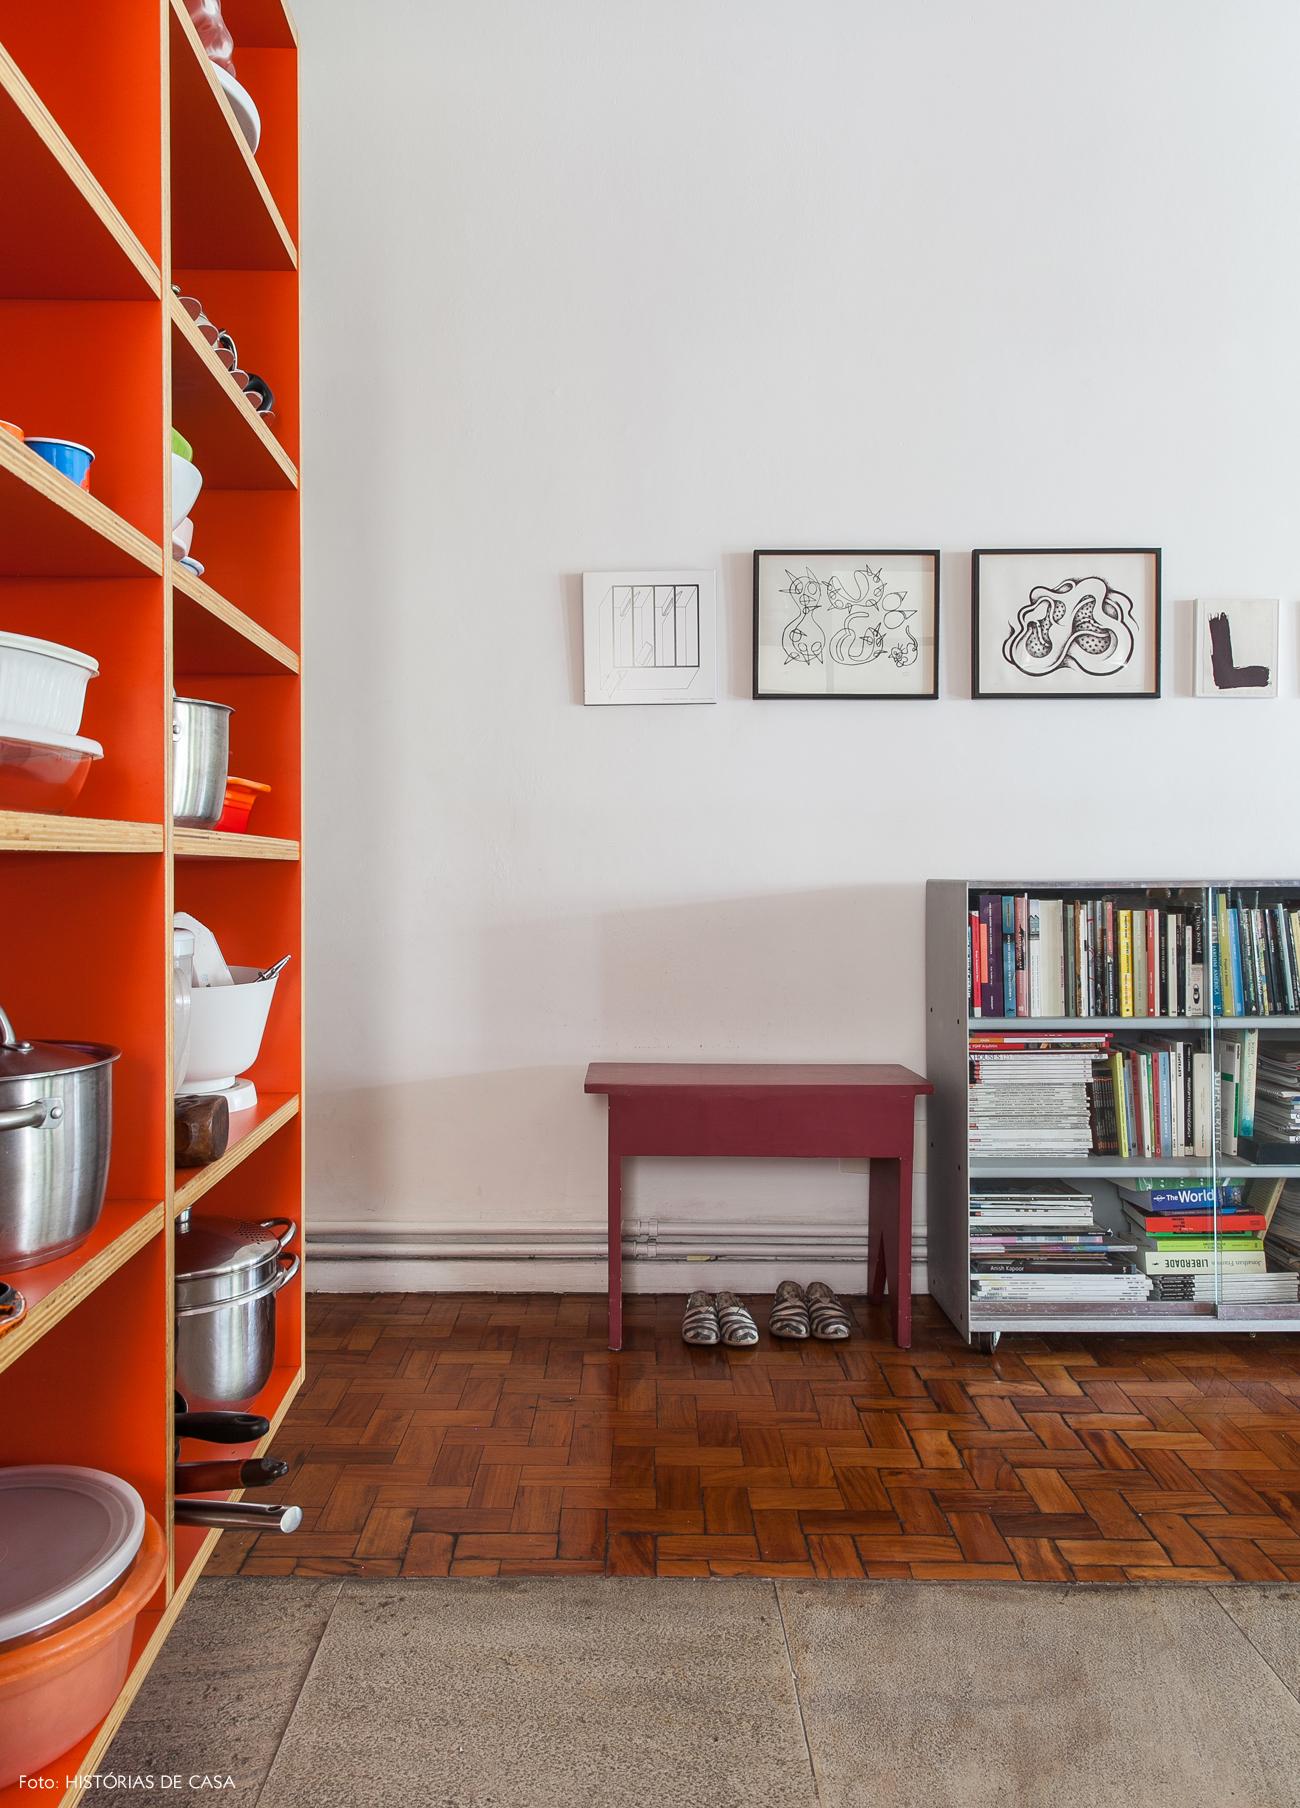 10-decoracao-cozinha-integrada-armario-sem-portas-laranja